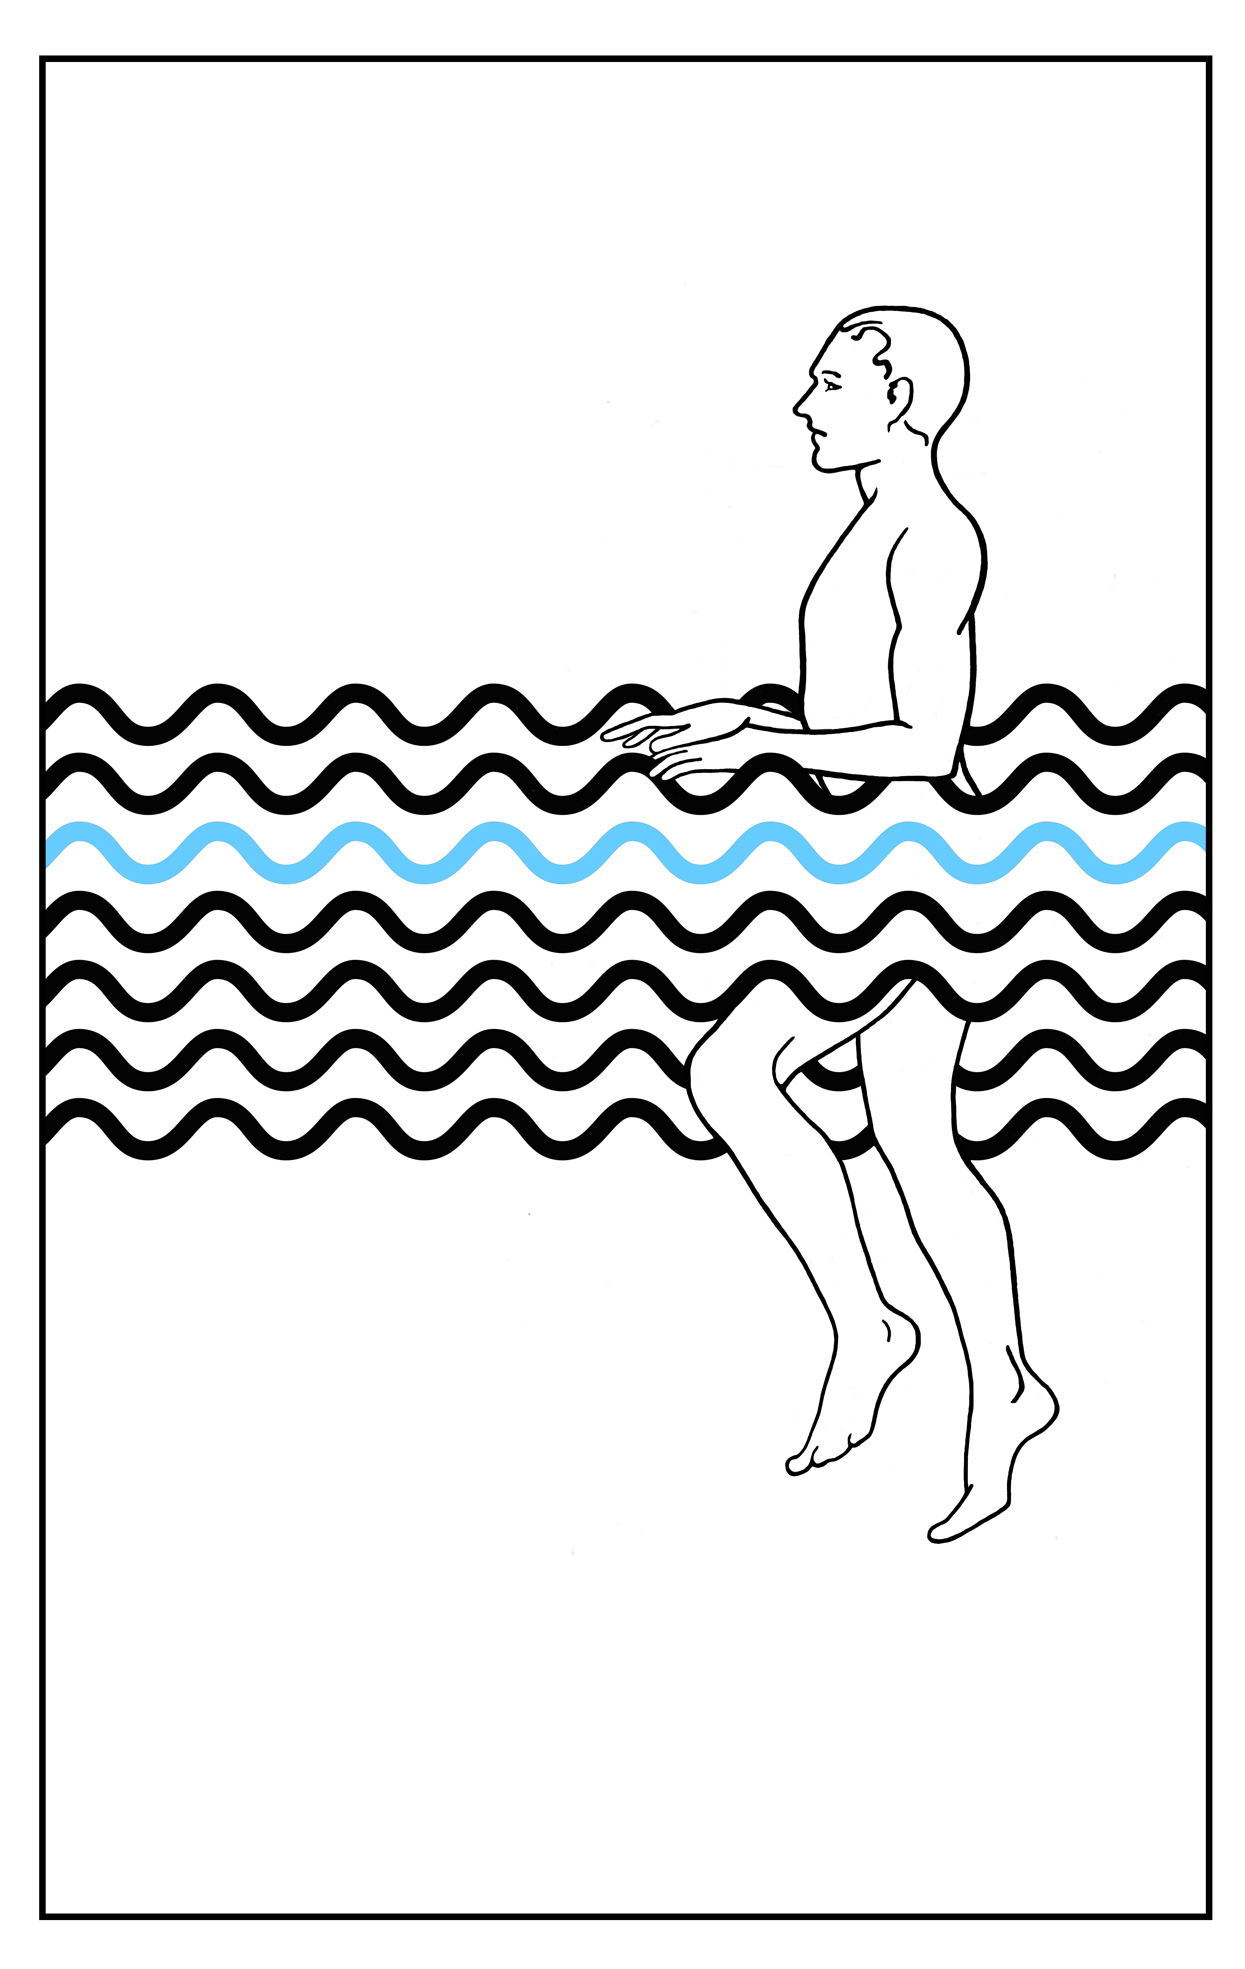 Treading_water.jpg